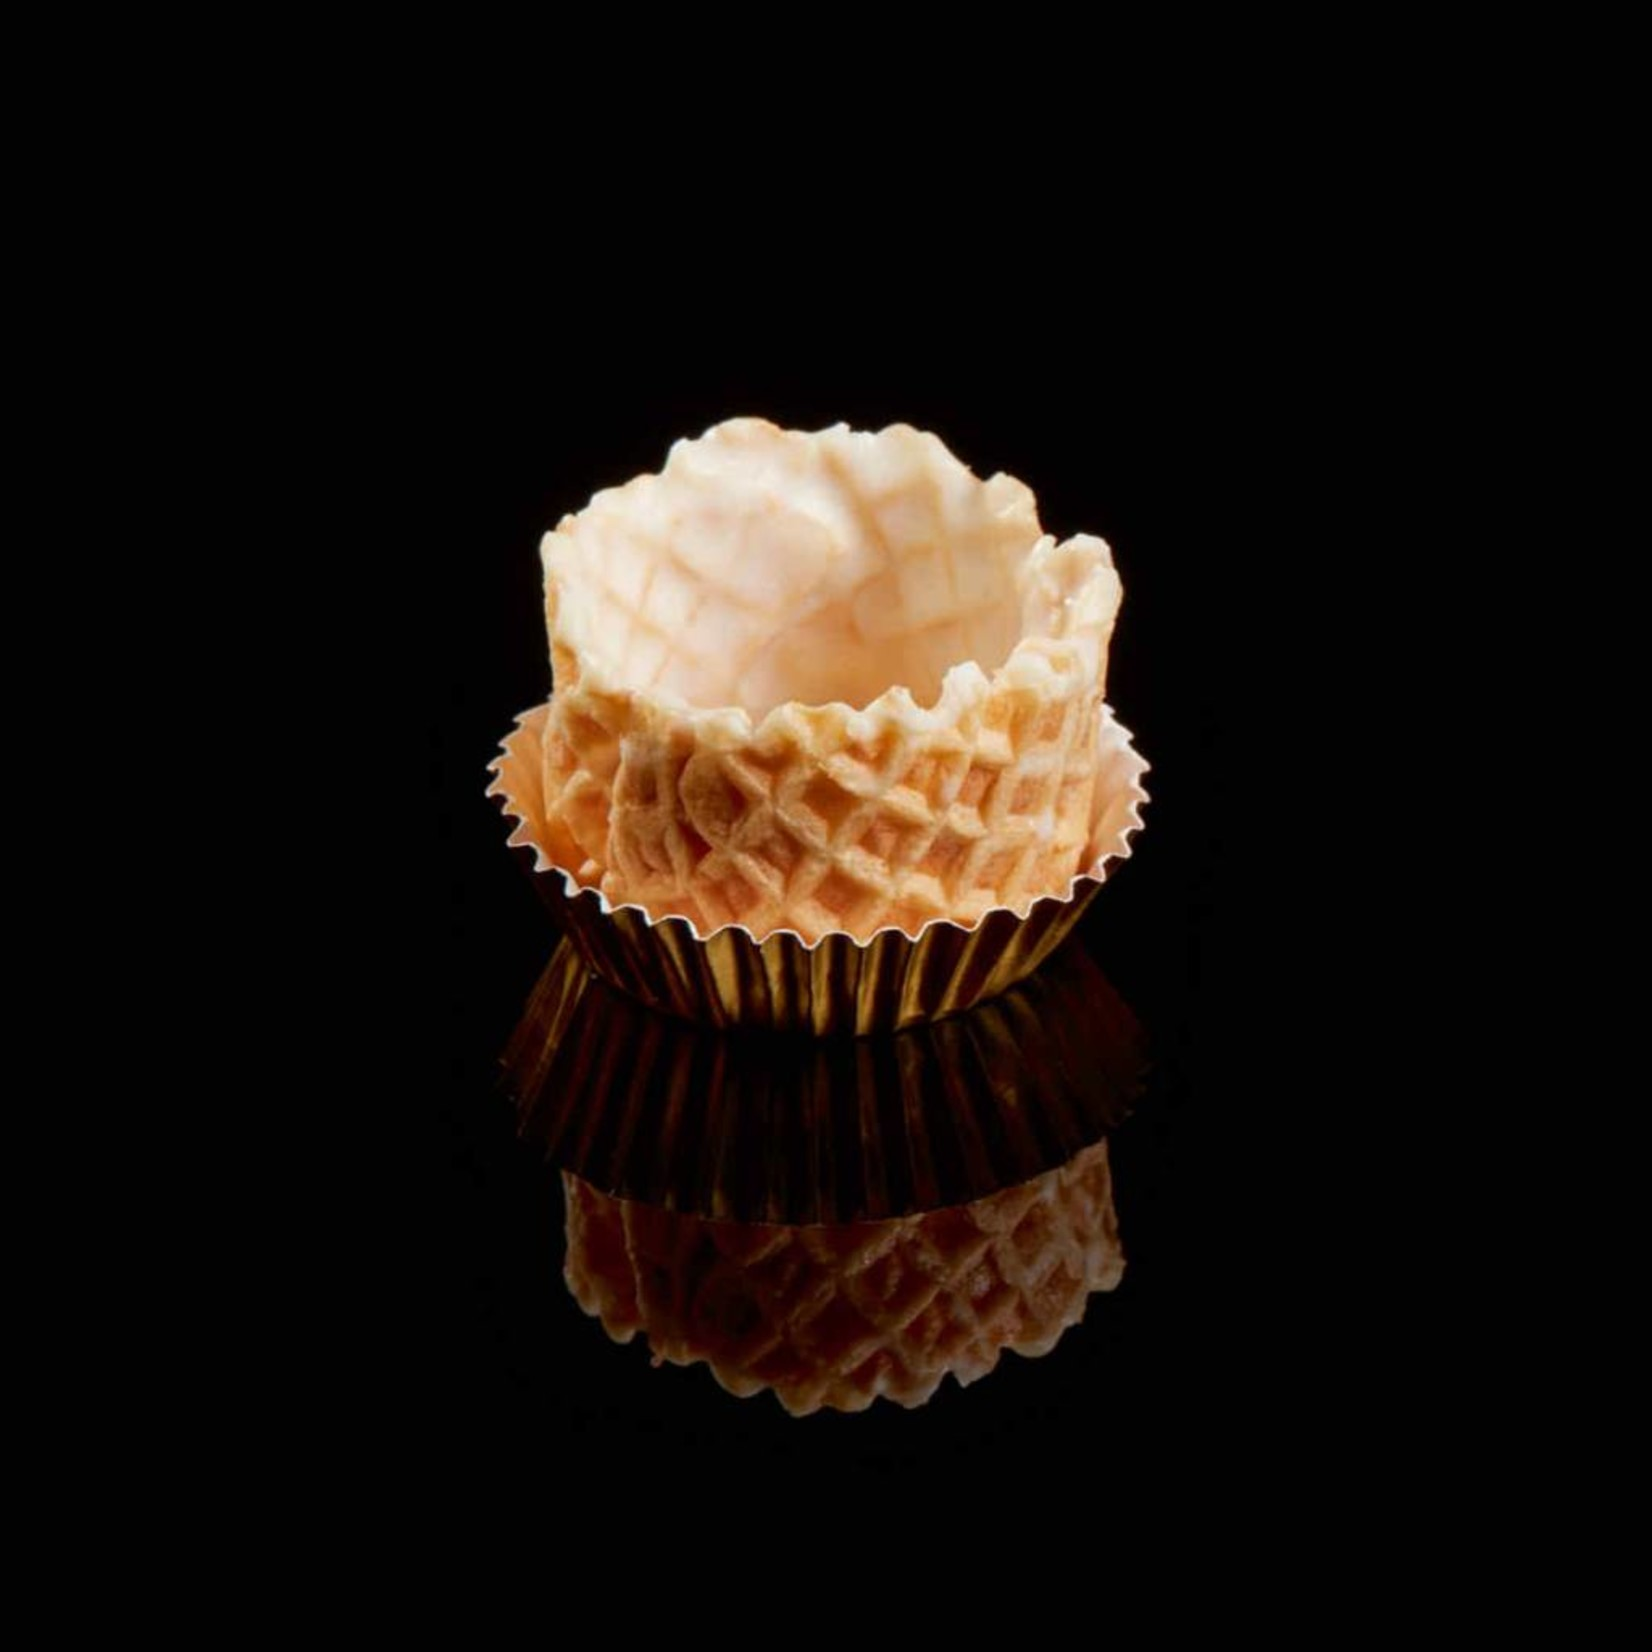 Delifrance Delifrance - Waffle Basket, Vanilla - 1.5'' (126ct), 78458